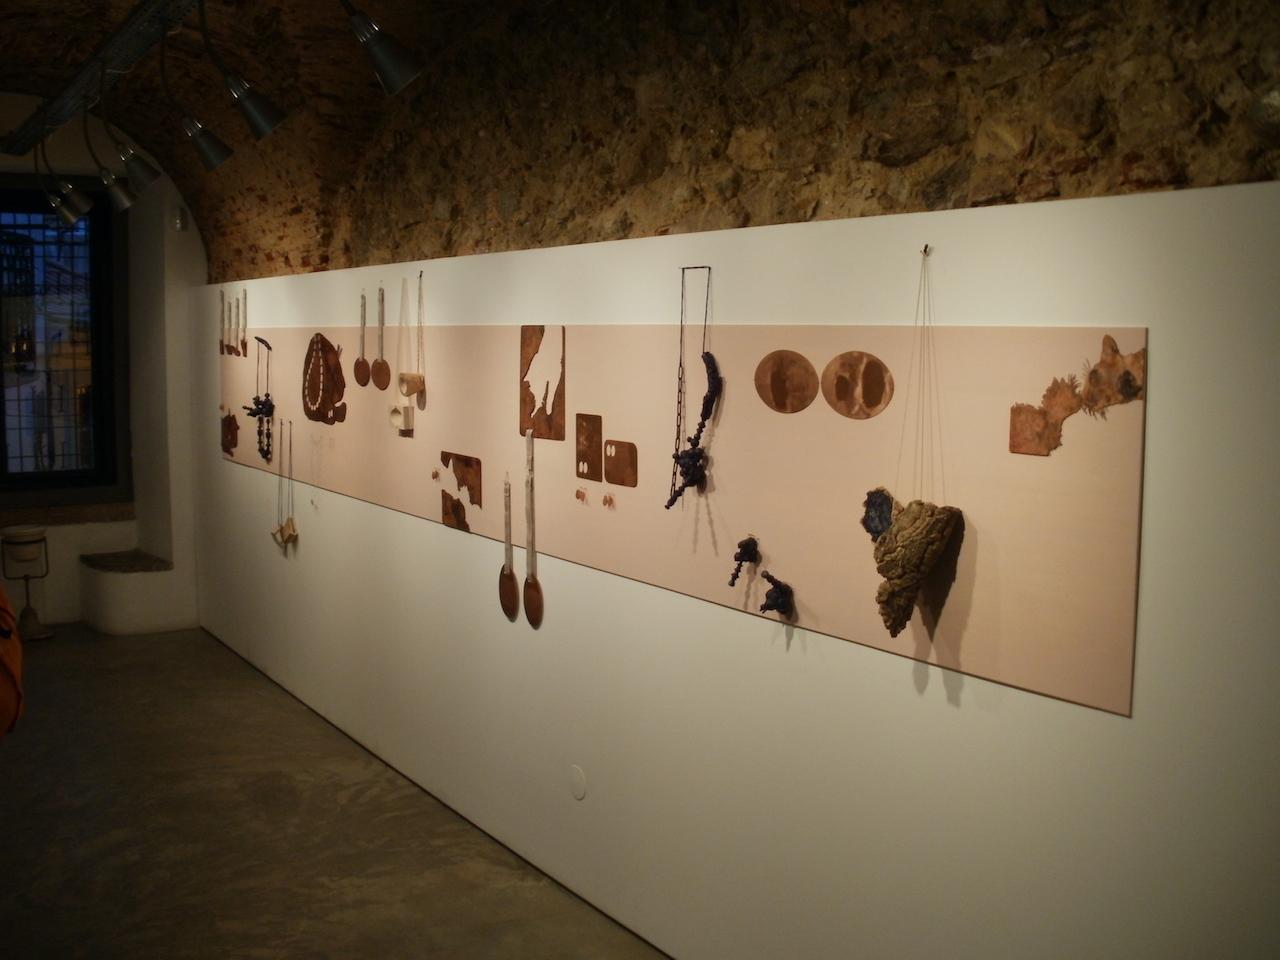 Galeria Articulo, Lissabon, interieur